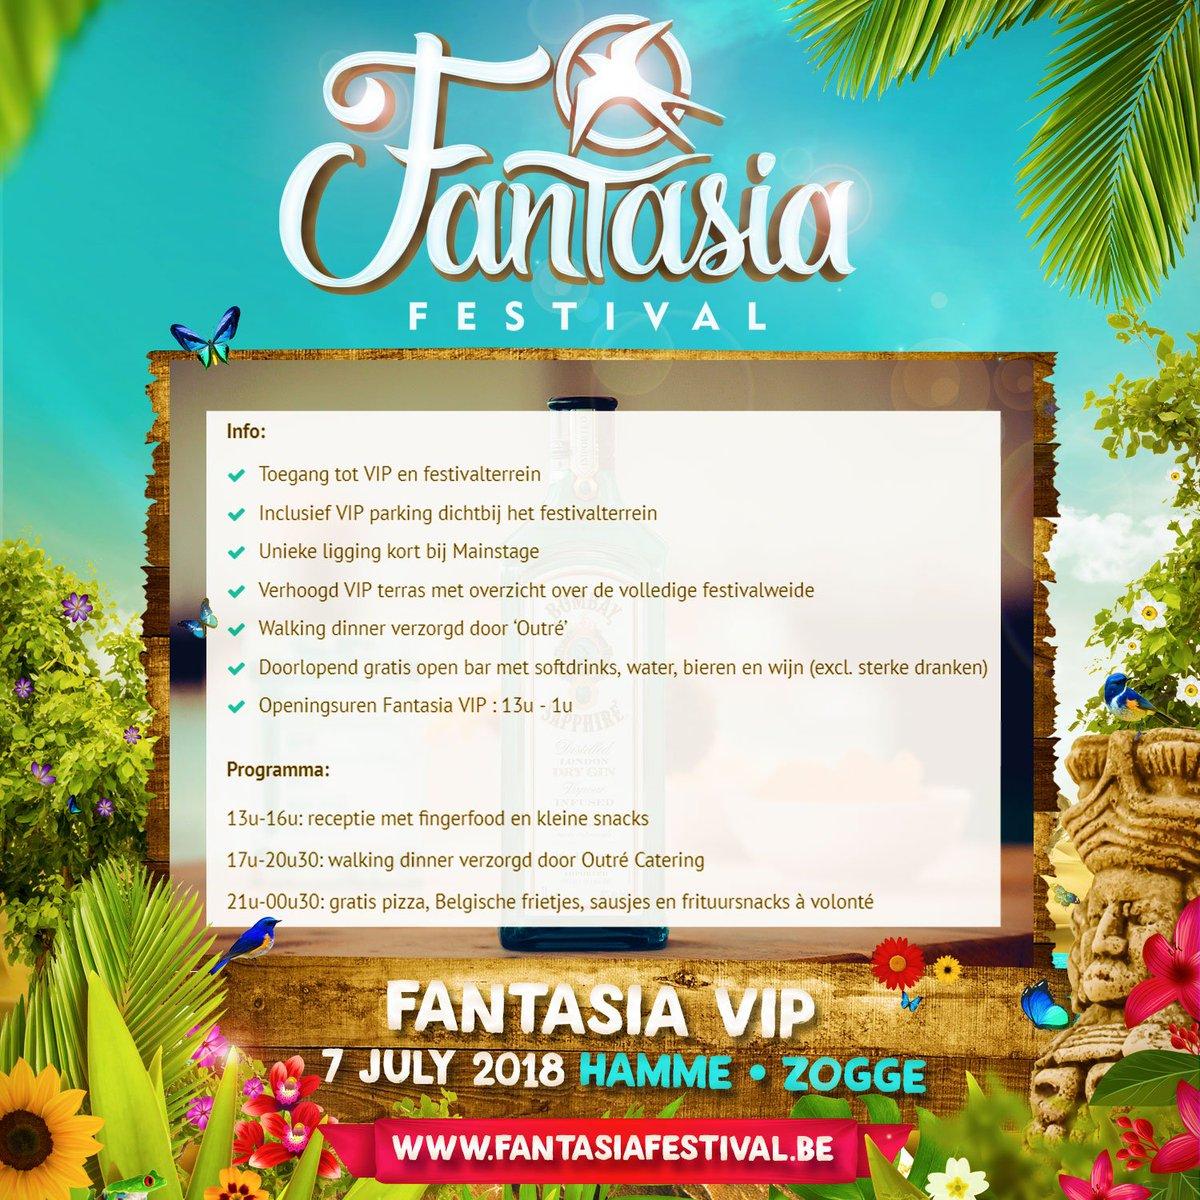 Uzivatel Fantasia Festival Na Twitteru Want To Party In Style On